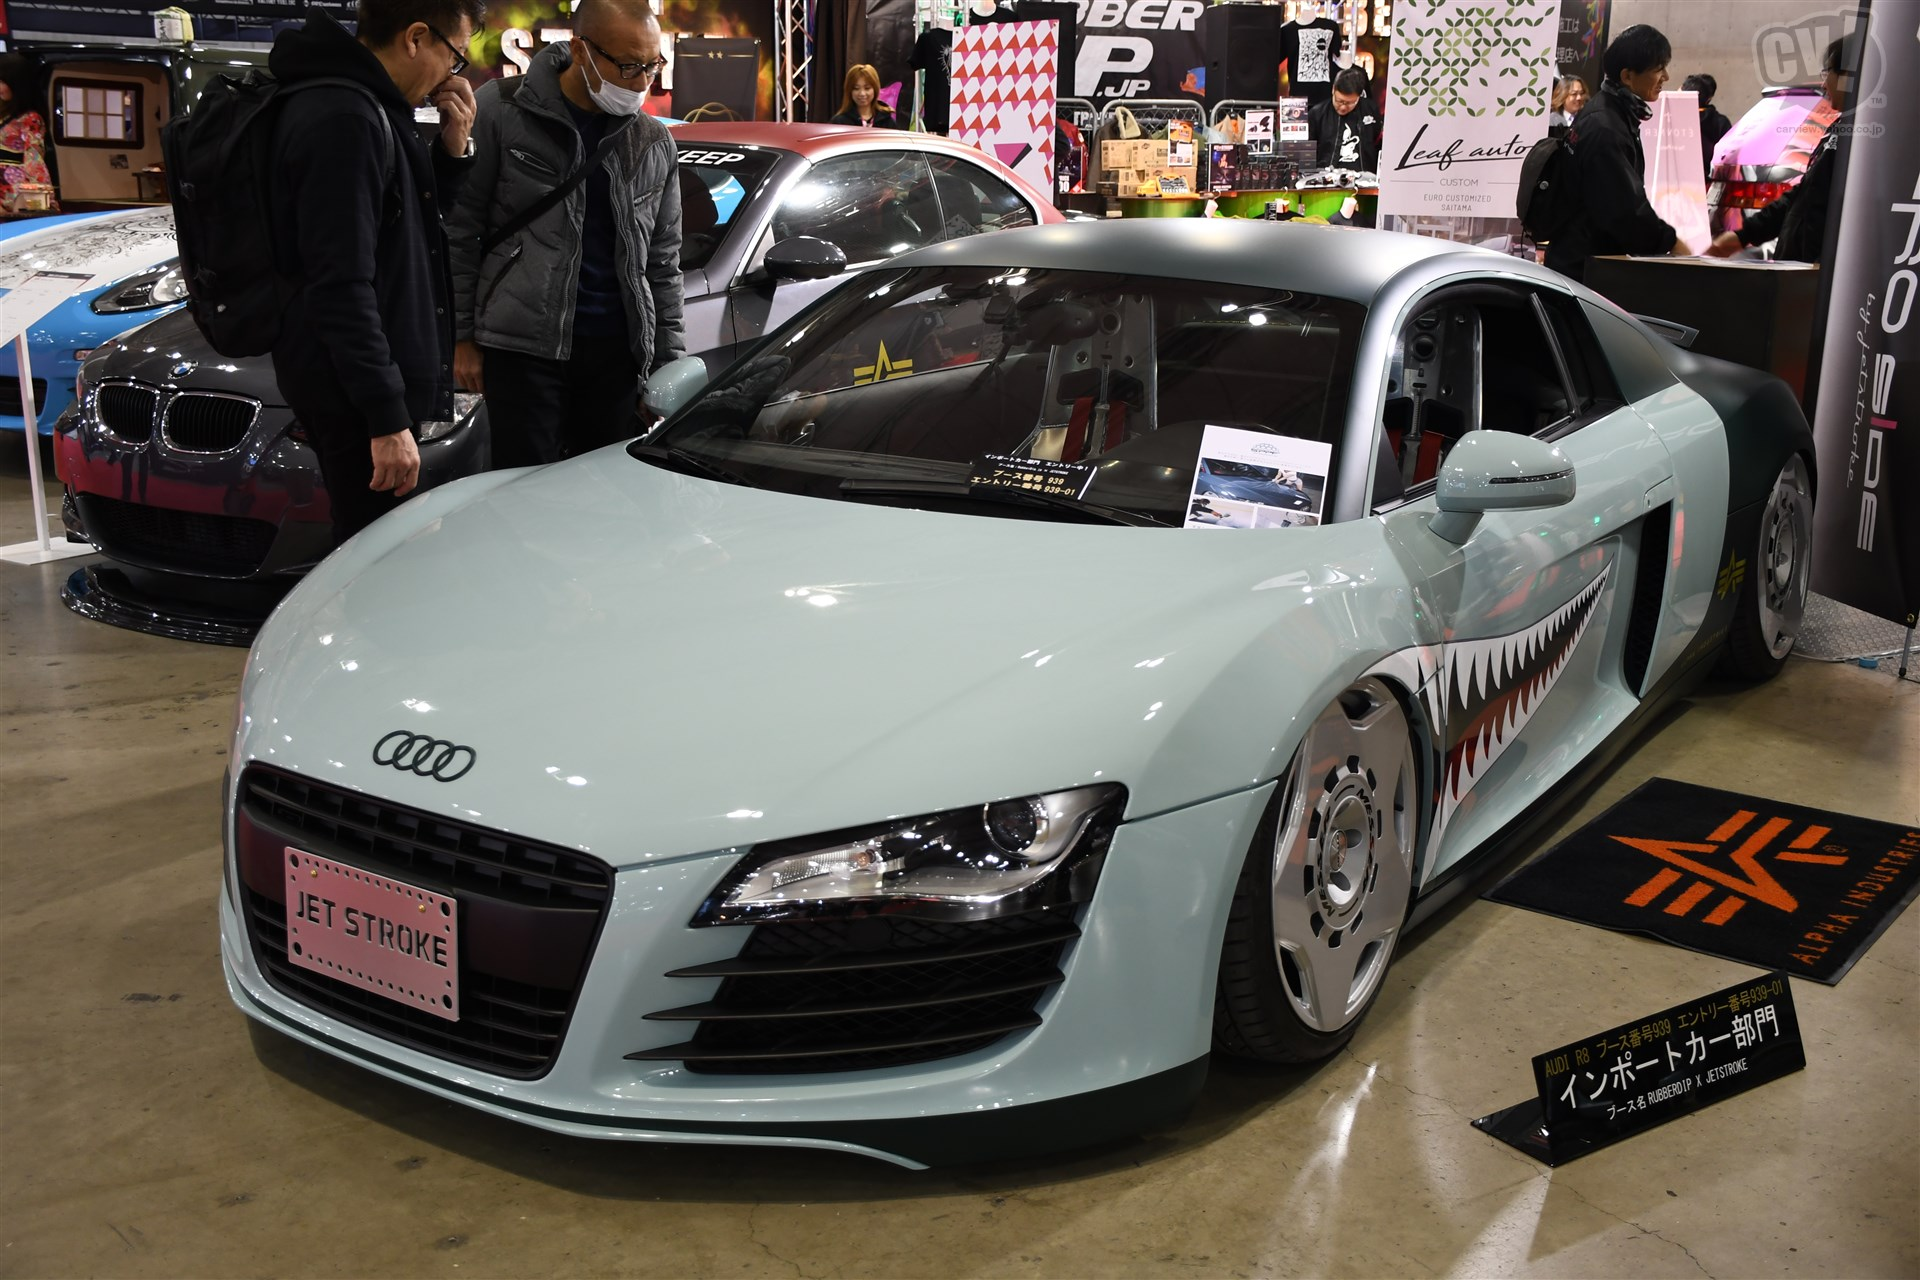 RubberDIP.jp X JETSTROKE Audi R8